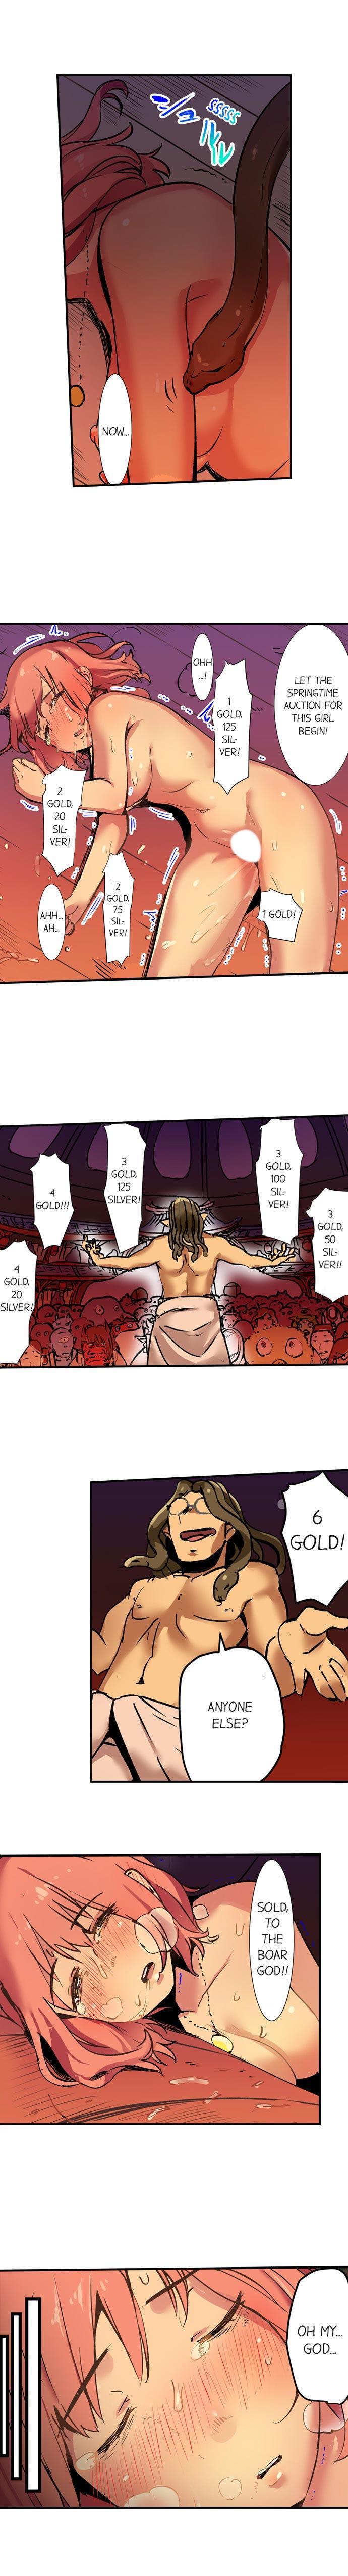 [Prhs] Yaoyorozu Sex~My Virginity Was Taken by Japanese Gods~ Ch. 3 [ENG] 7